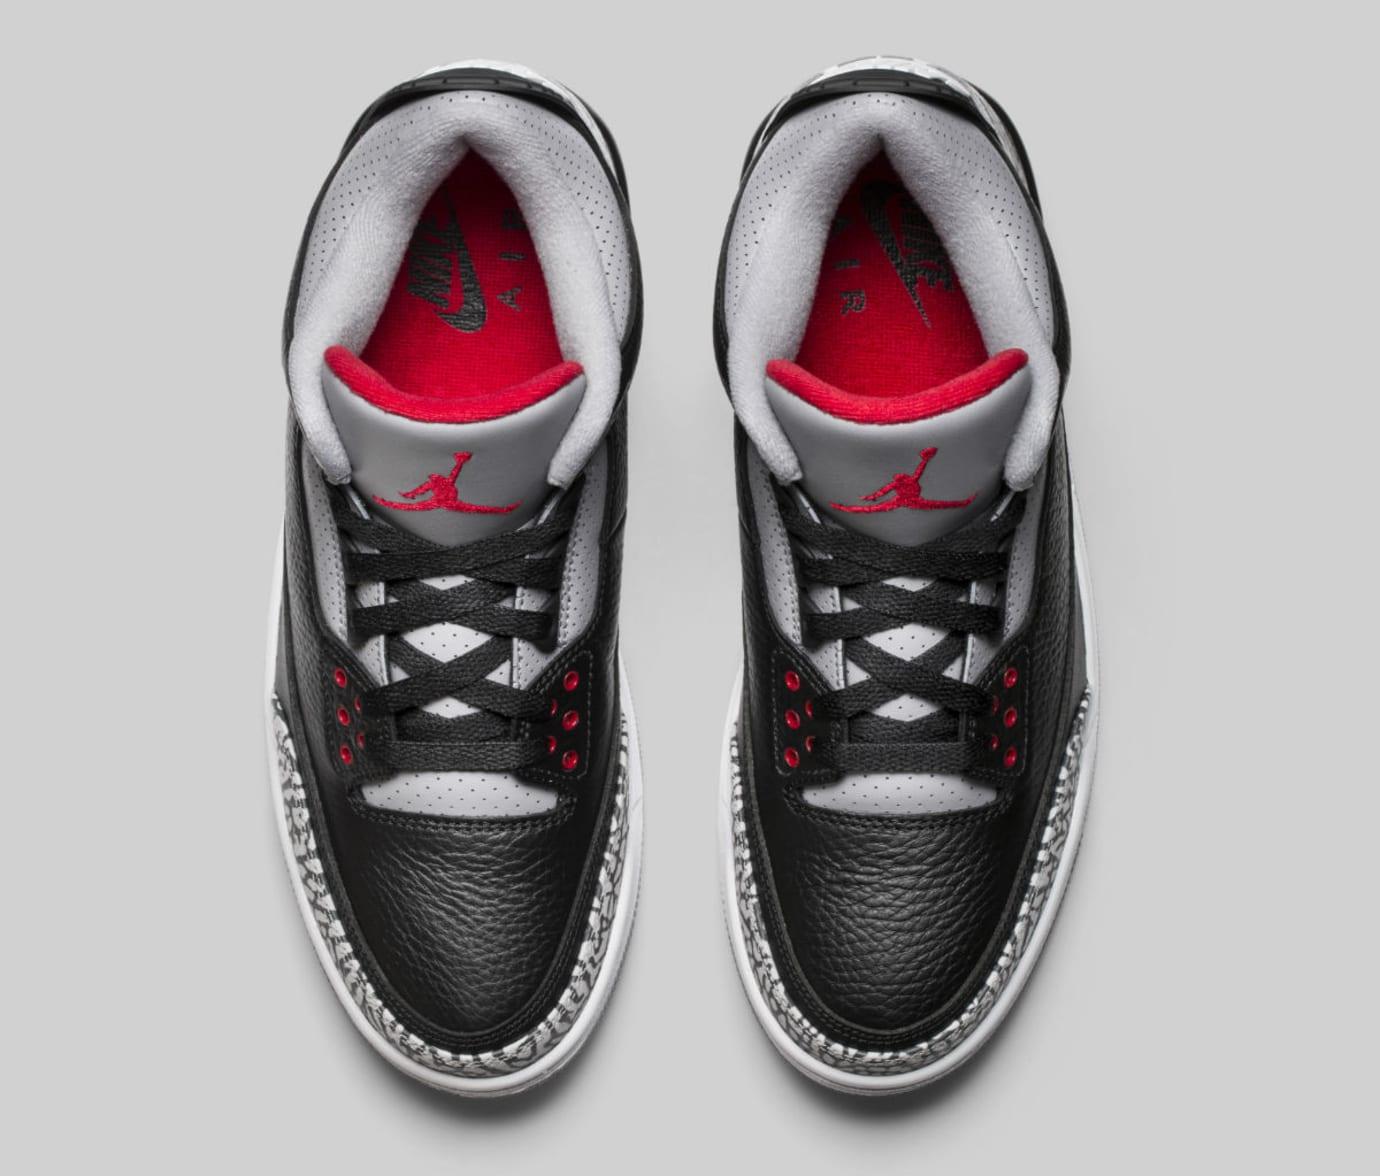 Air Jordan 3 III Black Cement Release Date 854262-001 Top